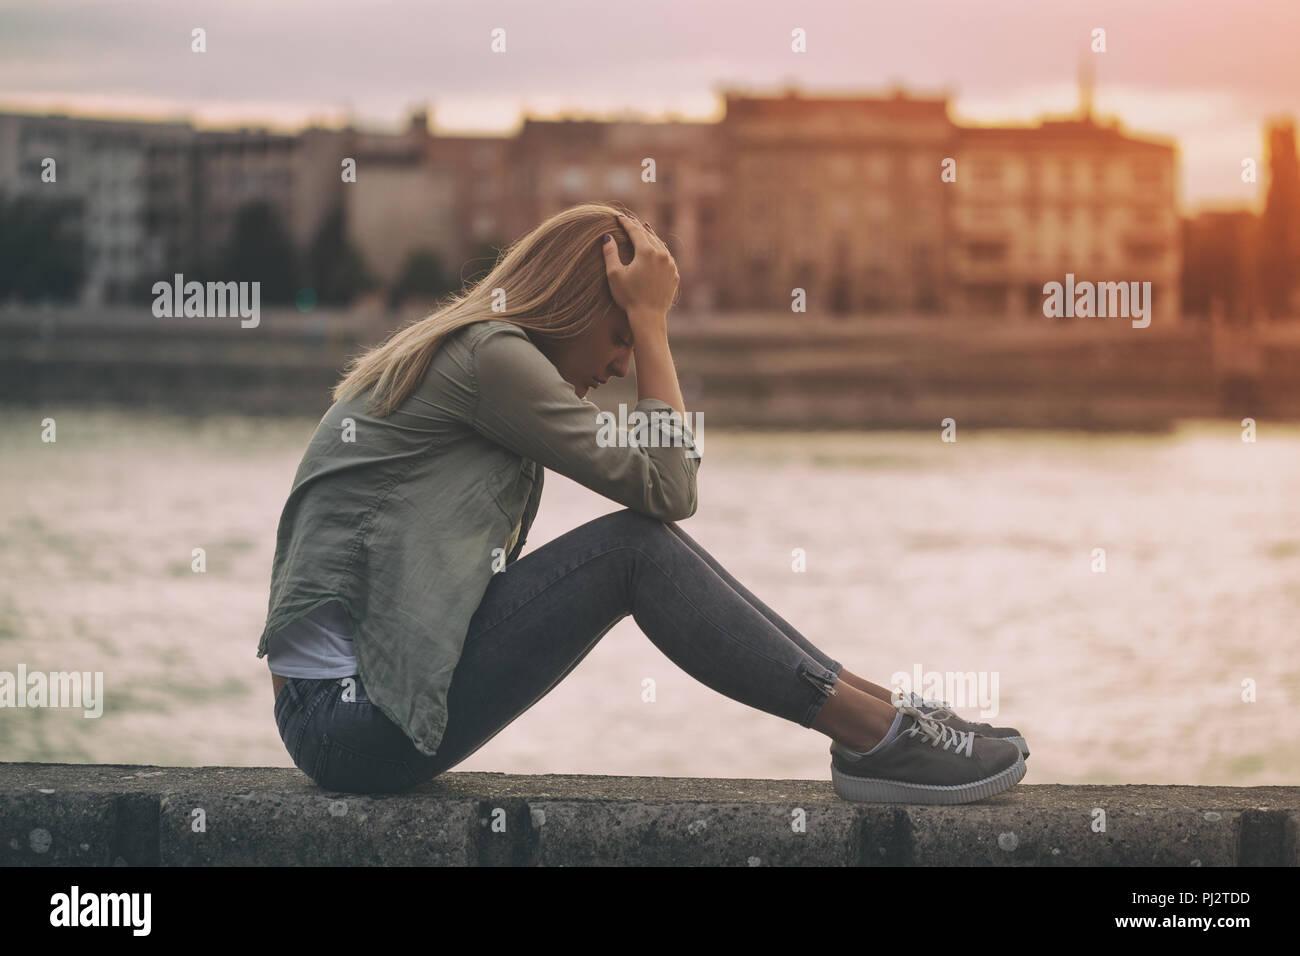 Traurige Frau am Ufer sitzen. Stockbild